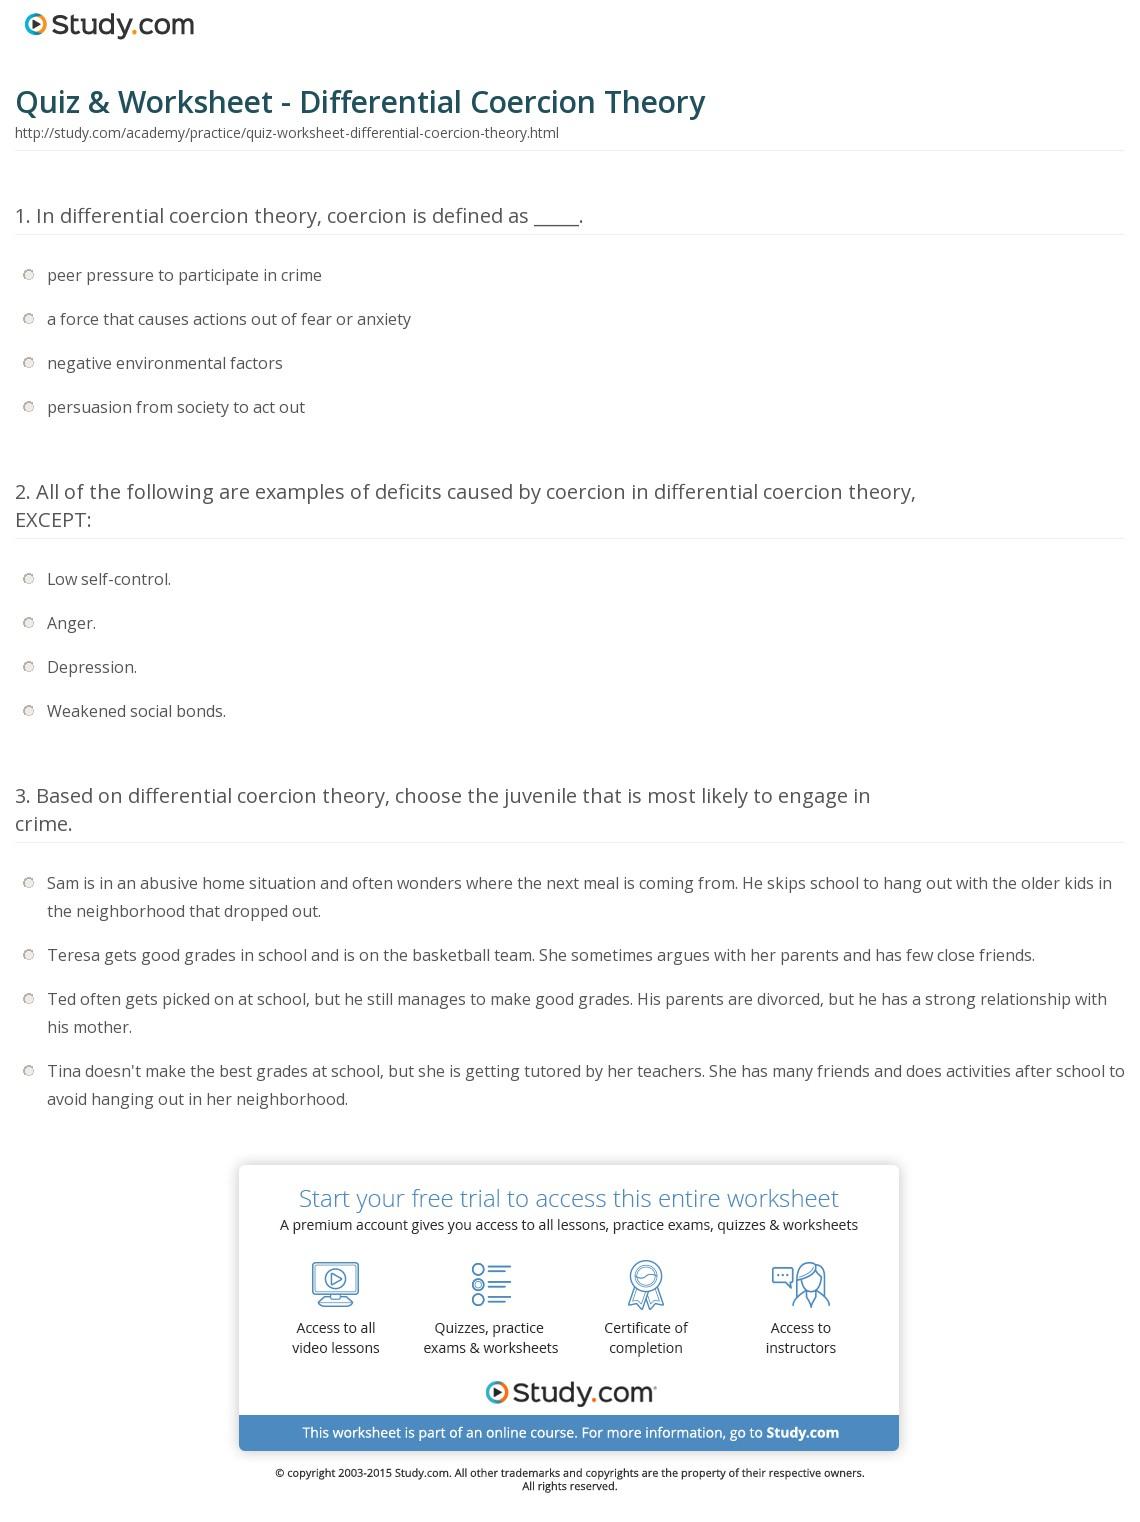 Quiz & Worksheet - Differential Coercion Theory | Study | Restorative Justice Printable Worksheets